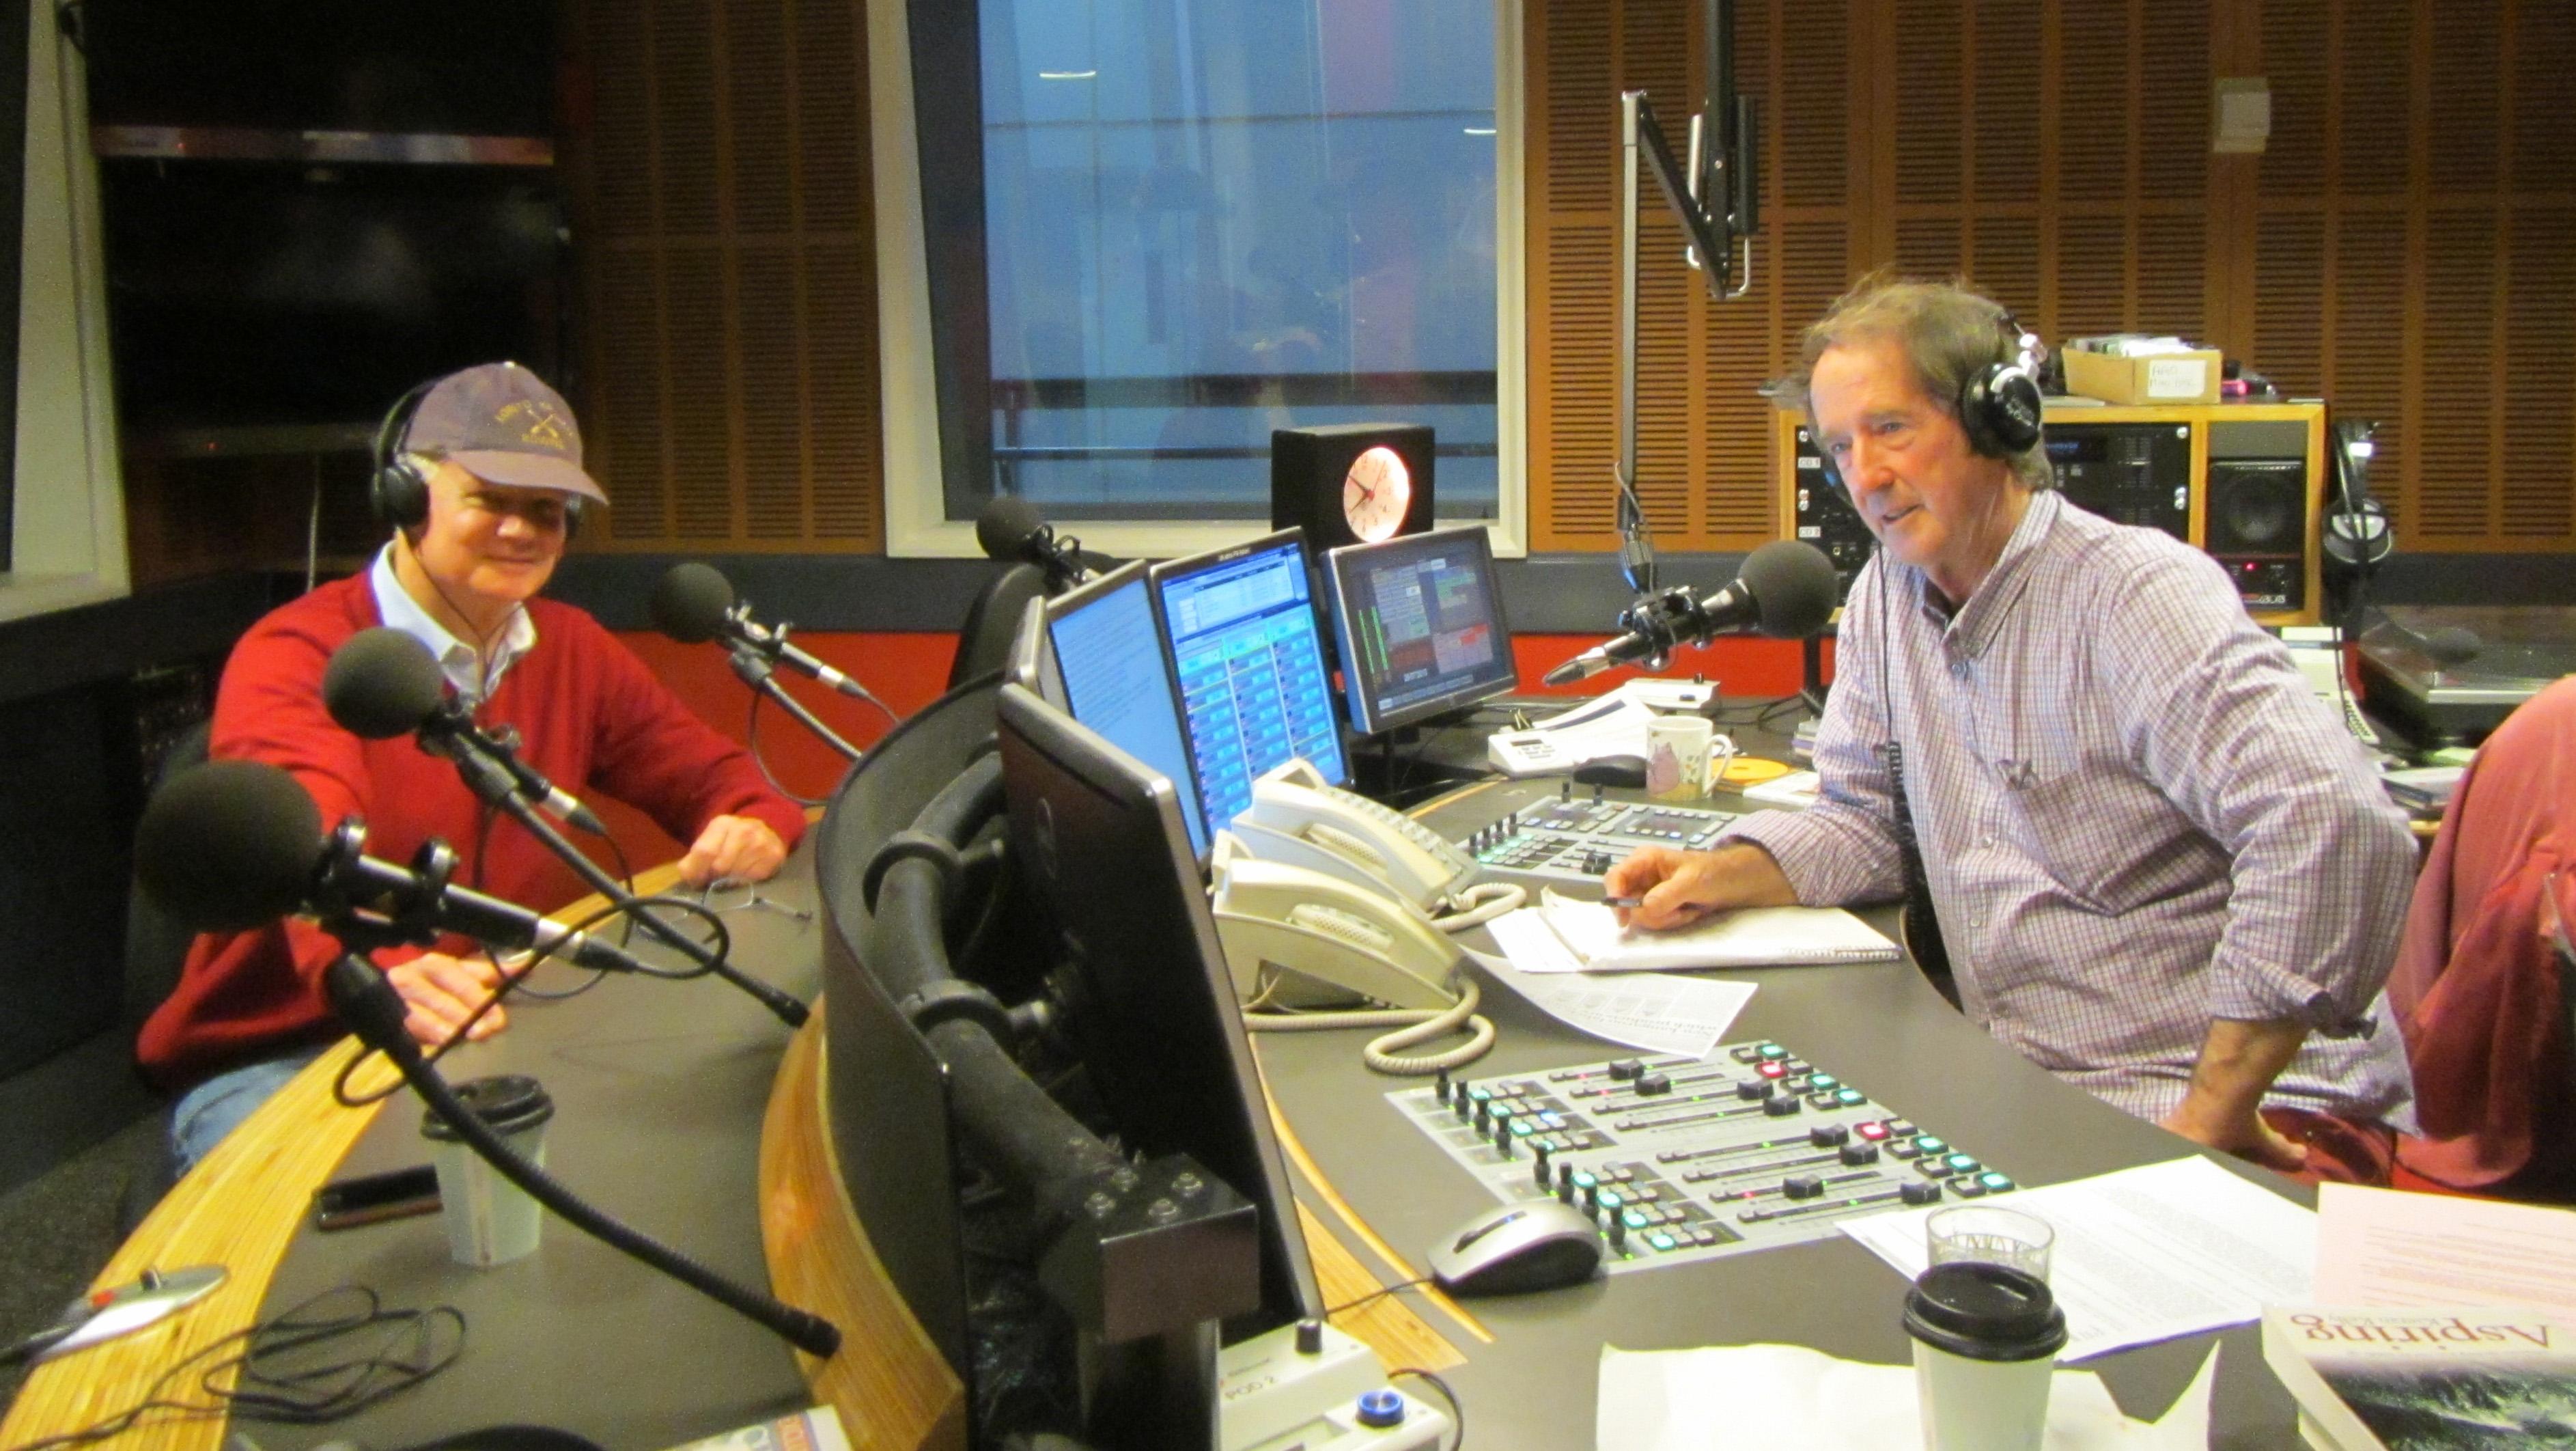 Appearing on ABC Radio show Australia All Over with Ian McNamara